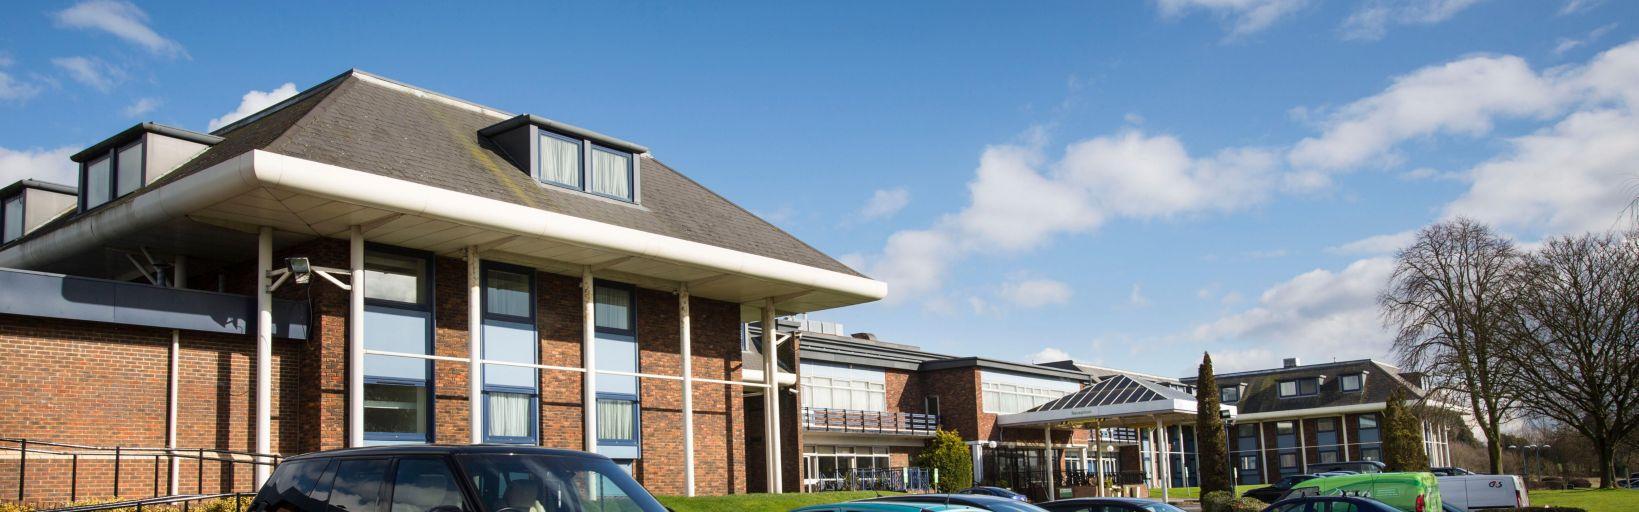 Holiday Inn Luton-South M1, Jct.9 Hotel by IHG